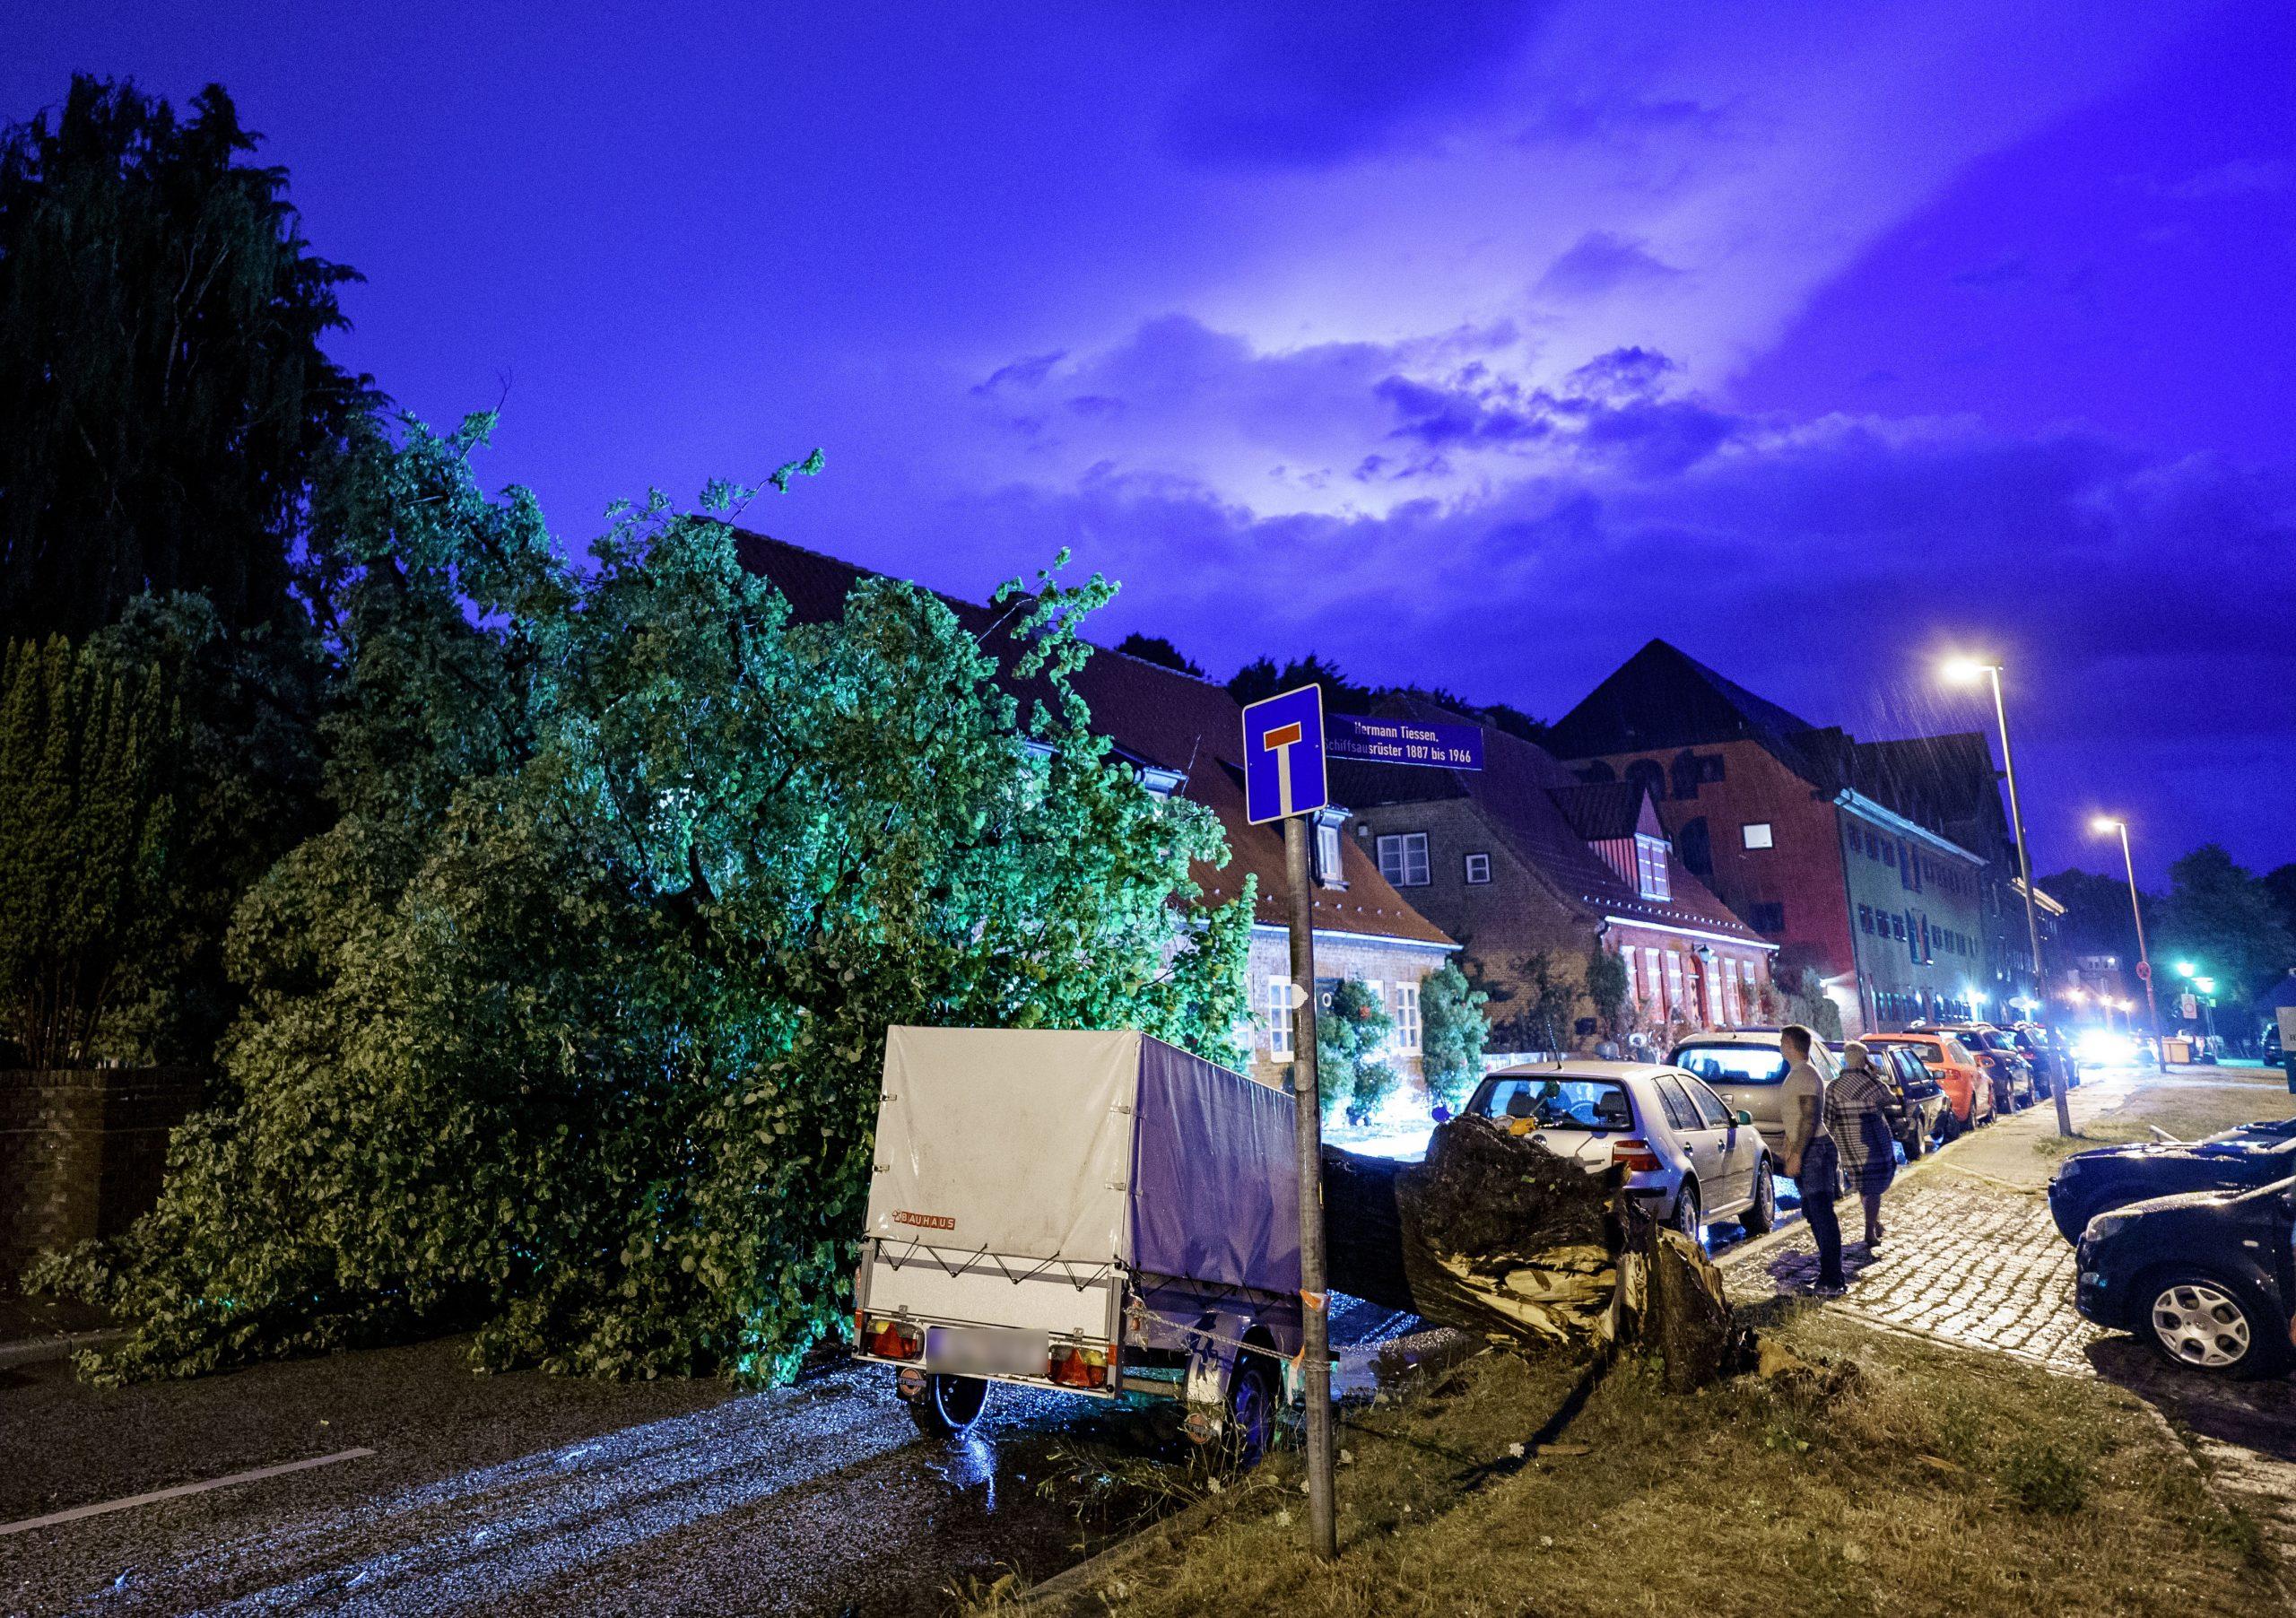 Ein umgekippter Baum versperrt die Straße in Kiel